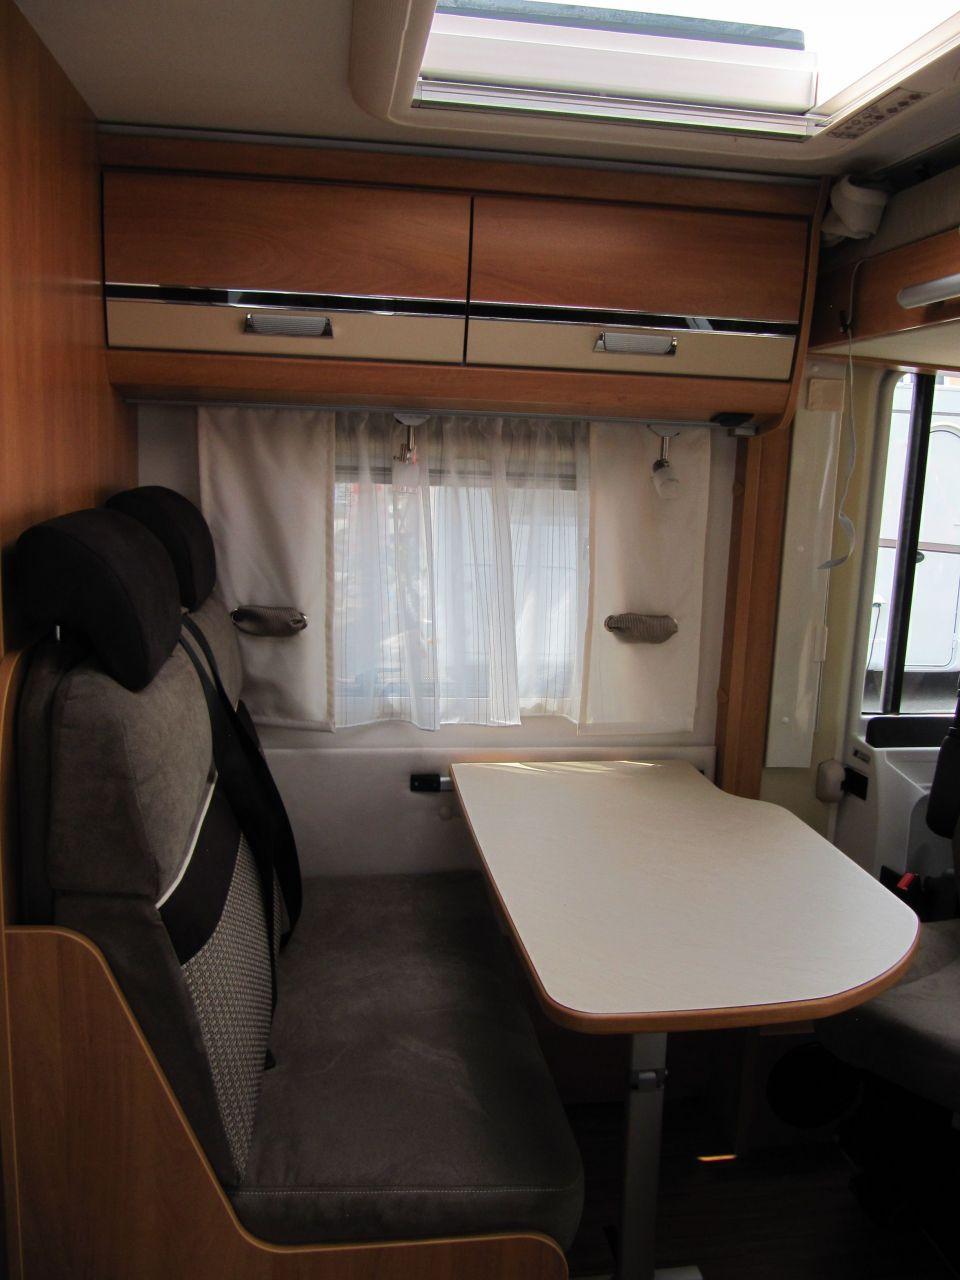 dethleffs globebus active i 11 als integrierter in m lheim an der ruhr bei. Black Bedroom Furniture Sets. Home Design Ideas